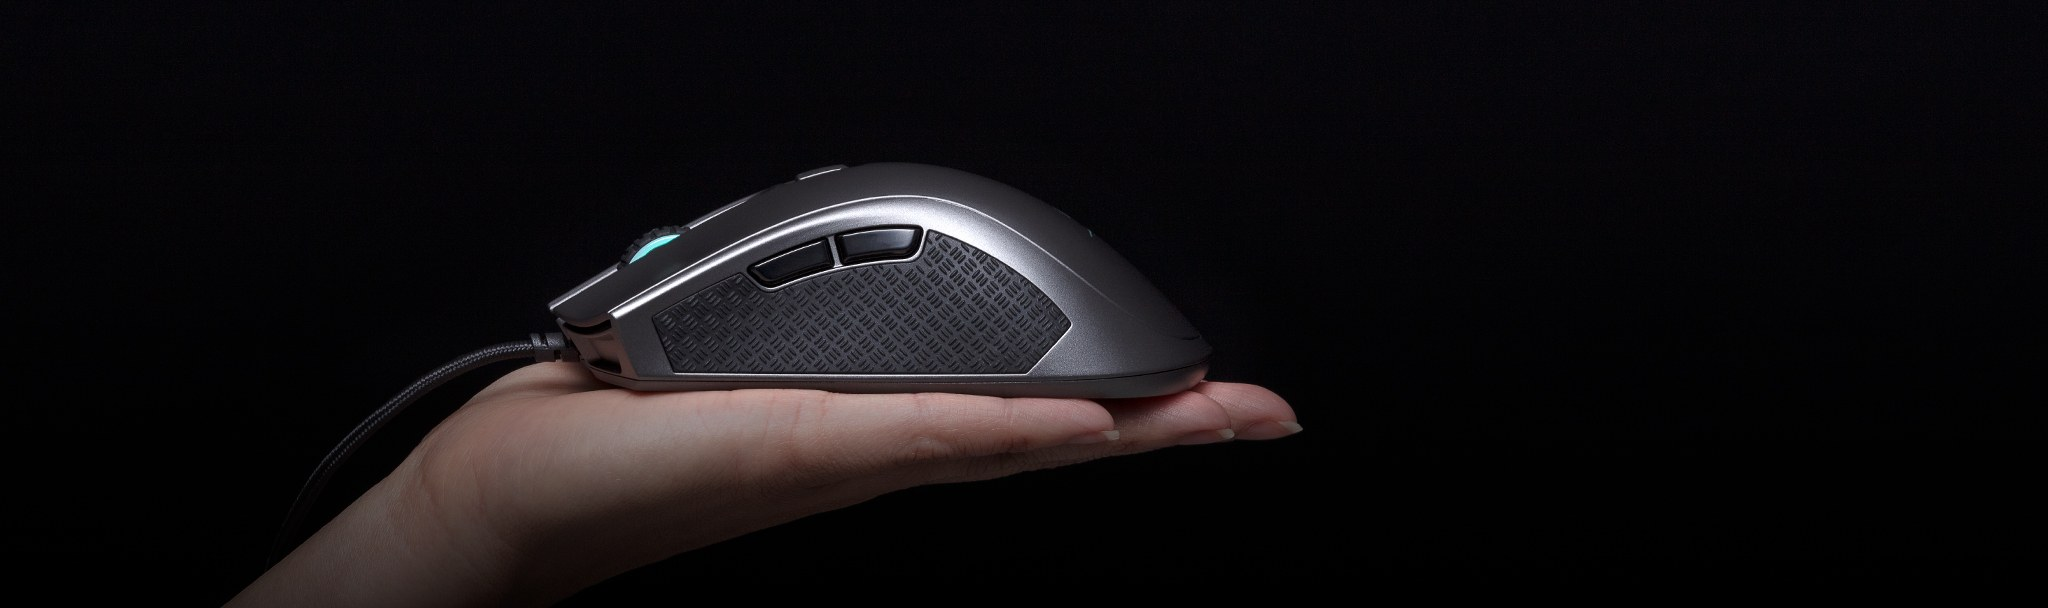 hx-keyfeatures-mice-pulsefire-fps-pro-2-lg